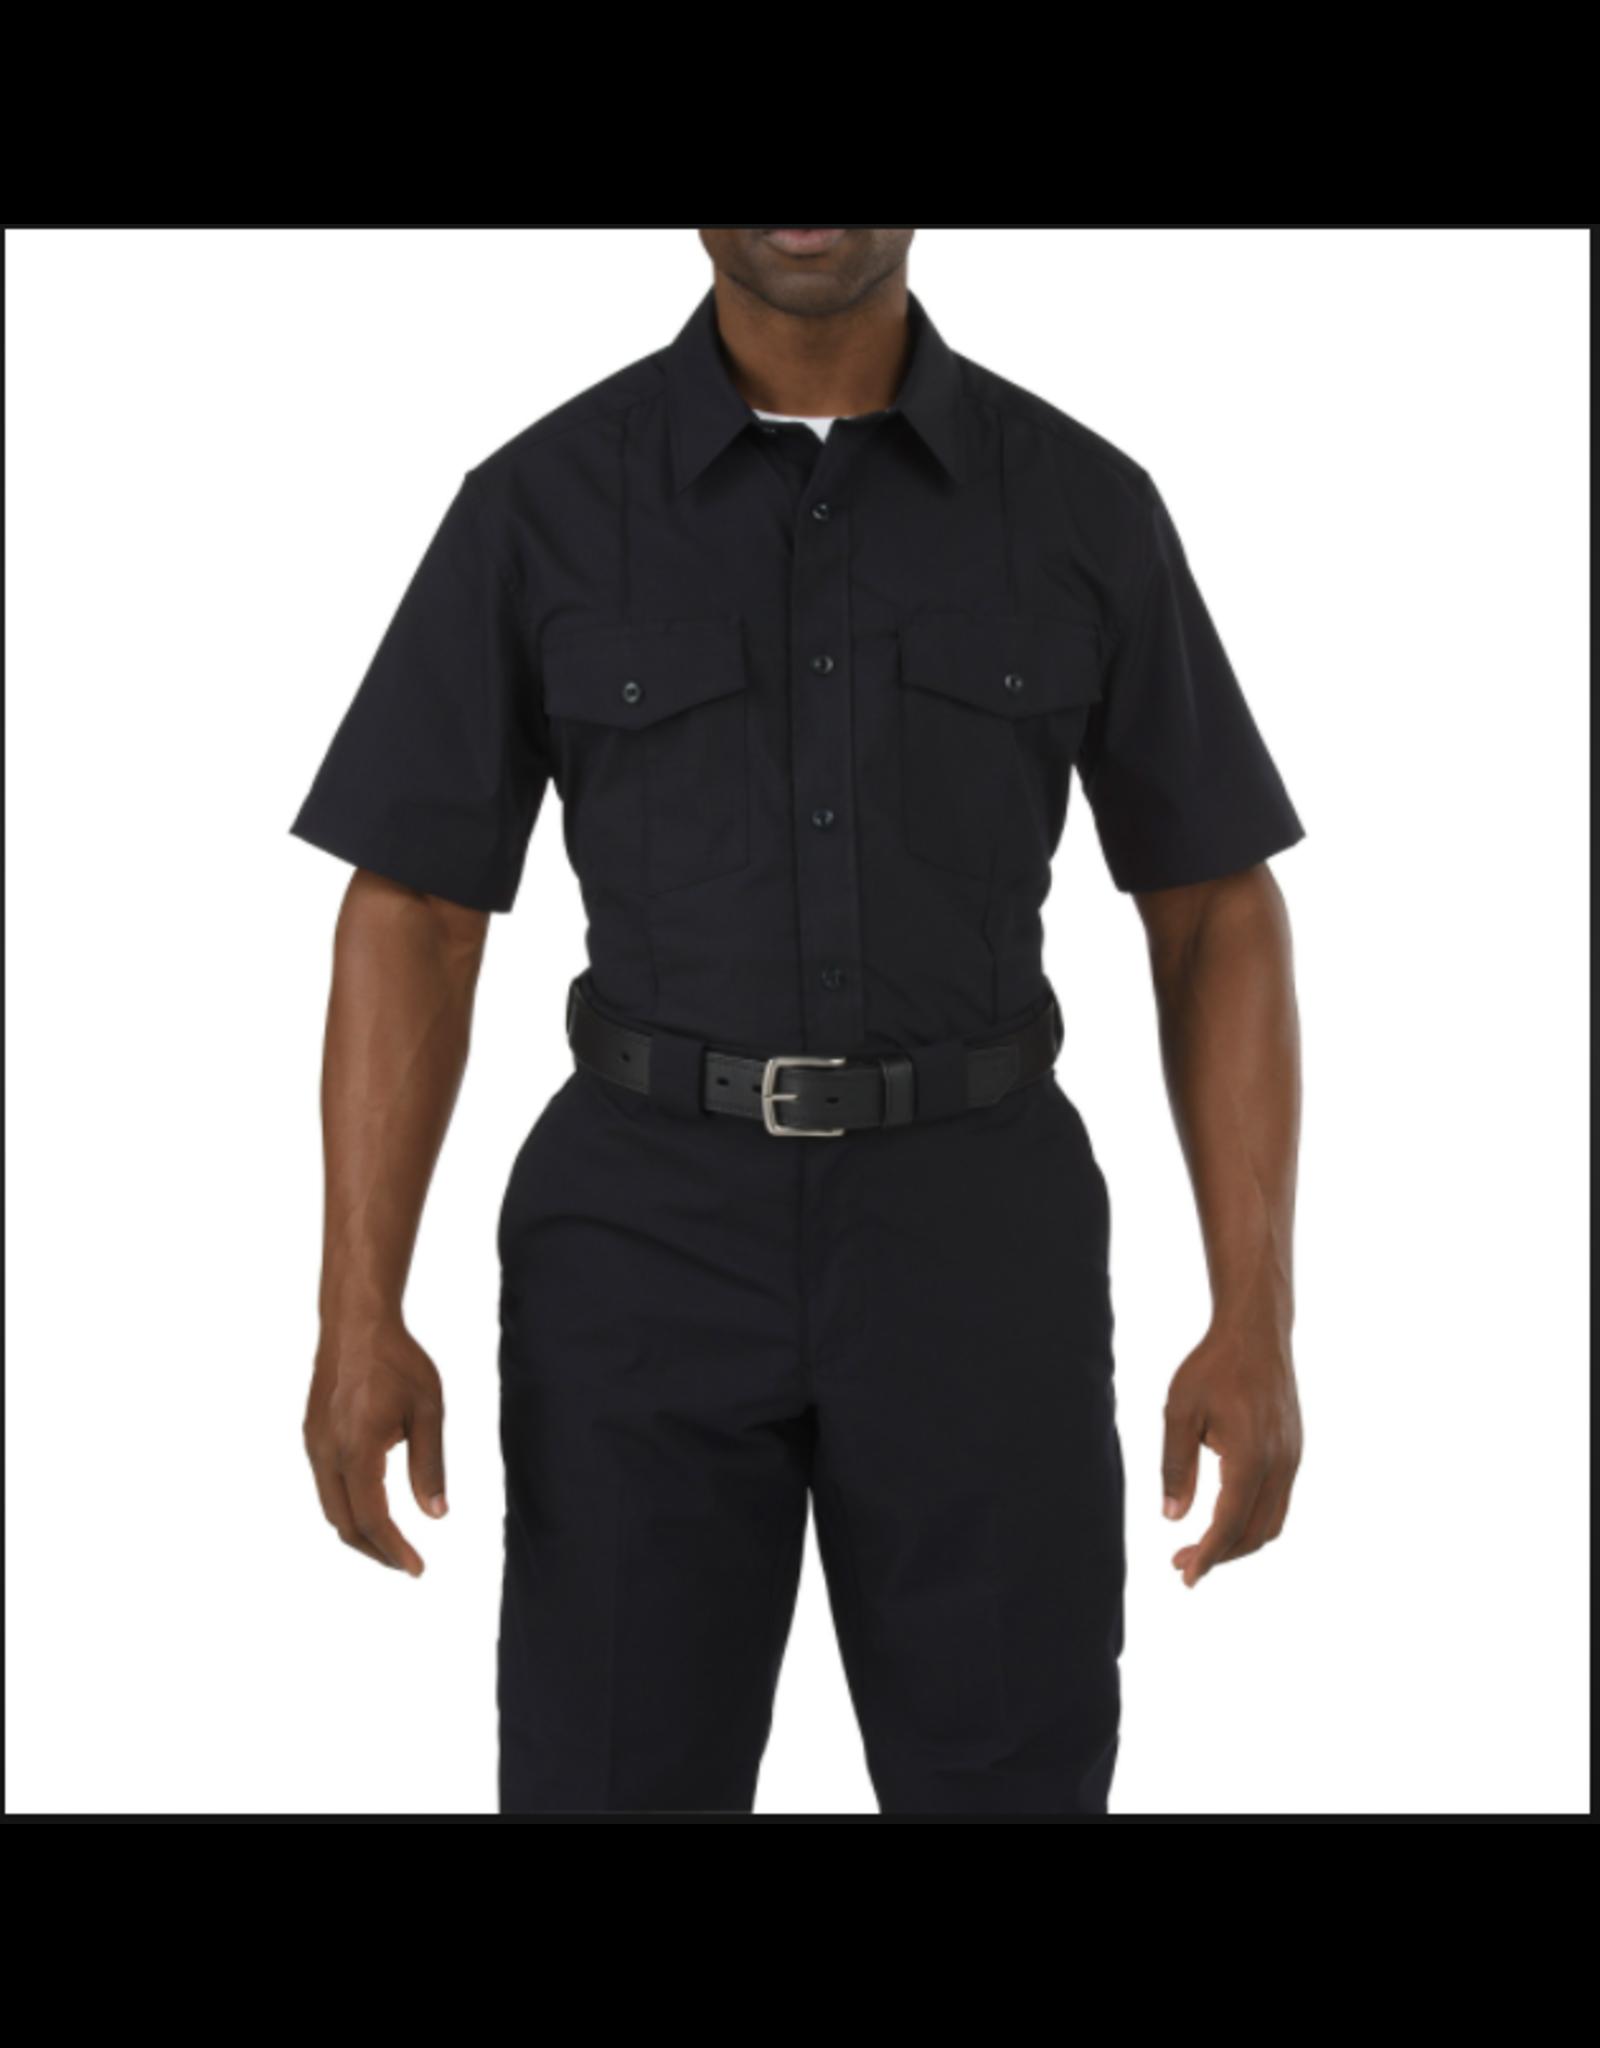 Propper Men's Class B Short Sleeve Shirt Black Med